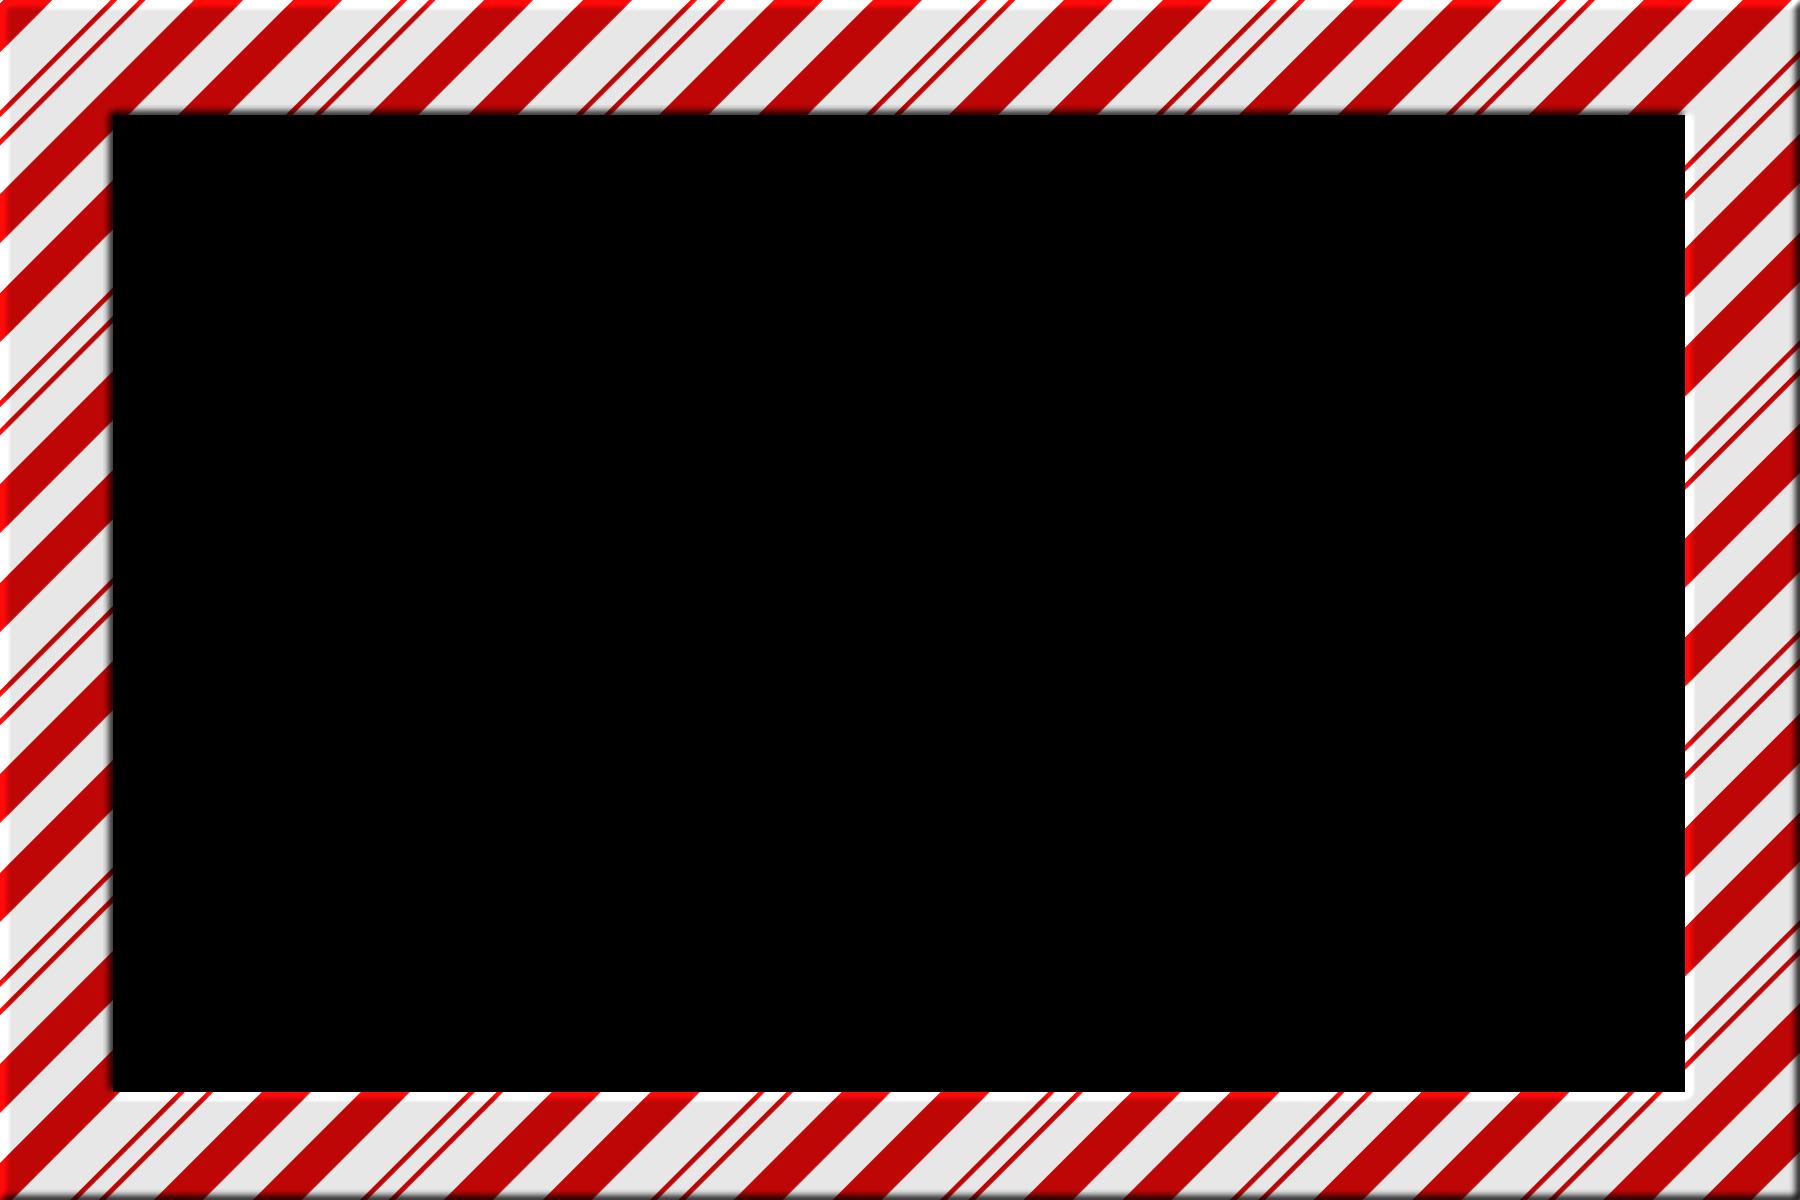 1800x1200 Candy Cane Border Clip Art Free